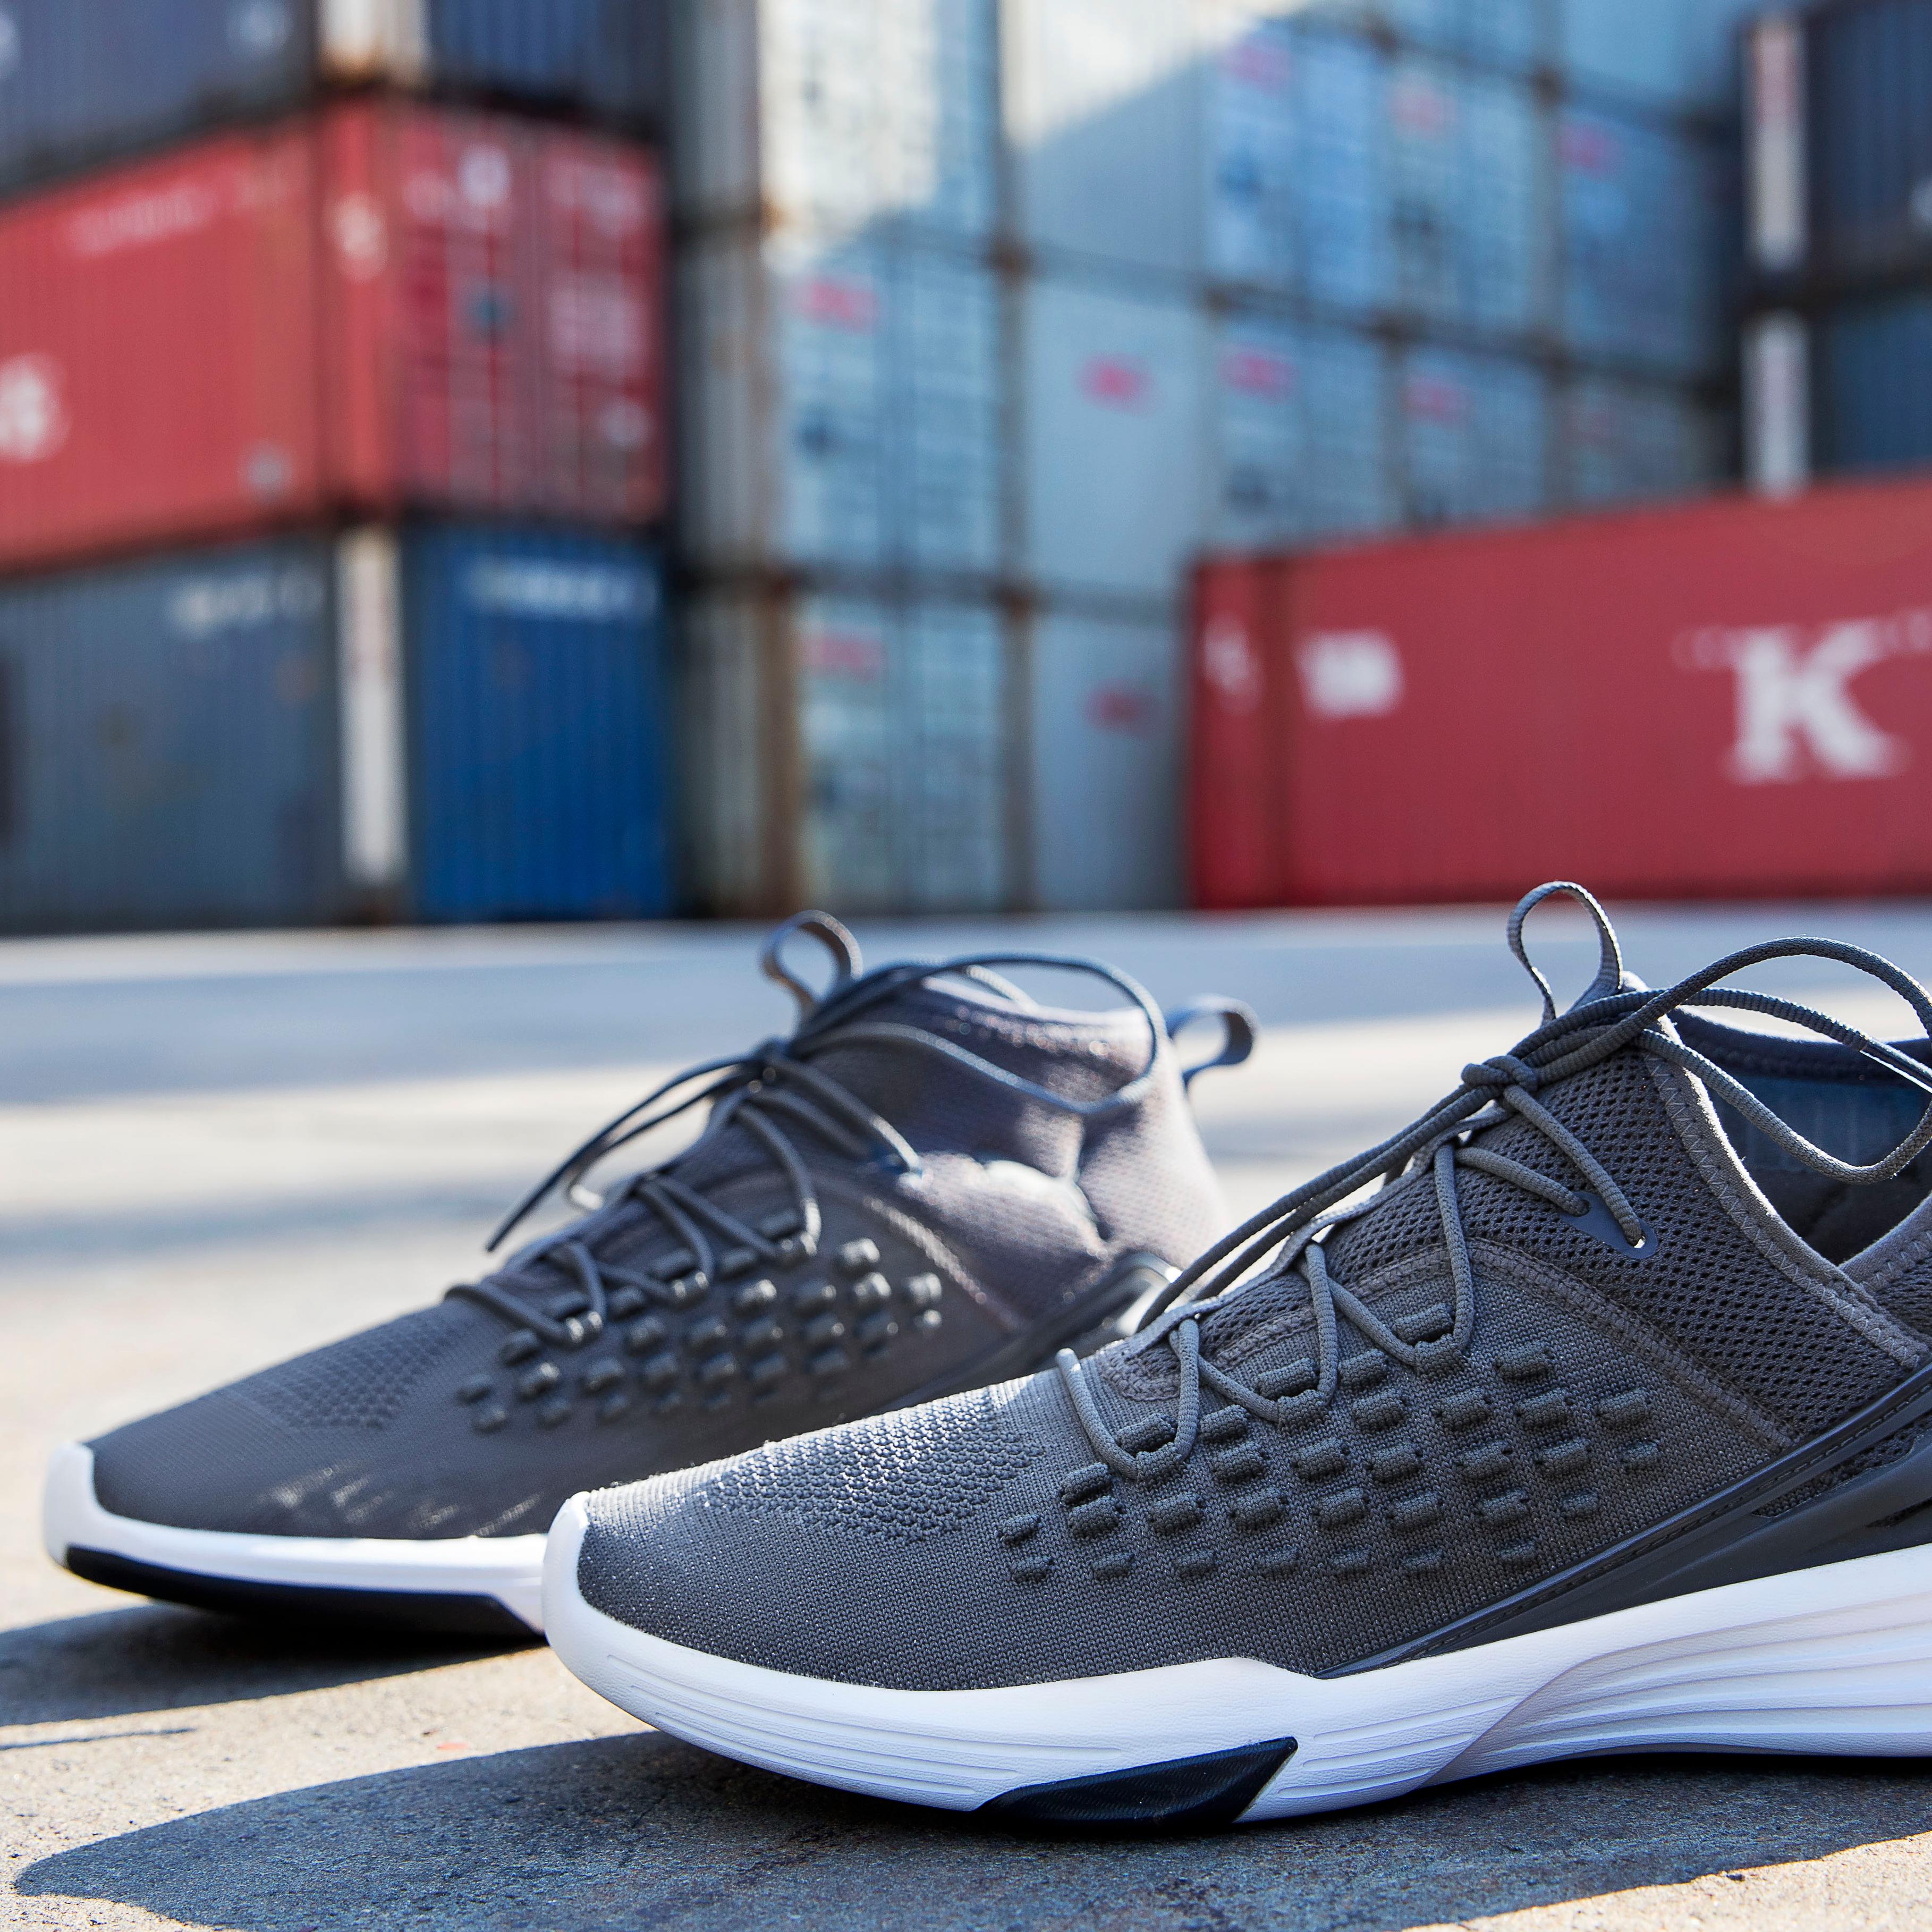 <p>爆發鋼鐵肌力─PUMA 全新訓練鞋款 Mantra FUSEFIT</p>